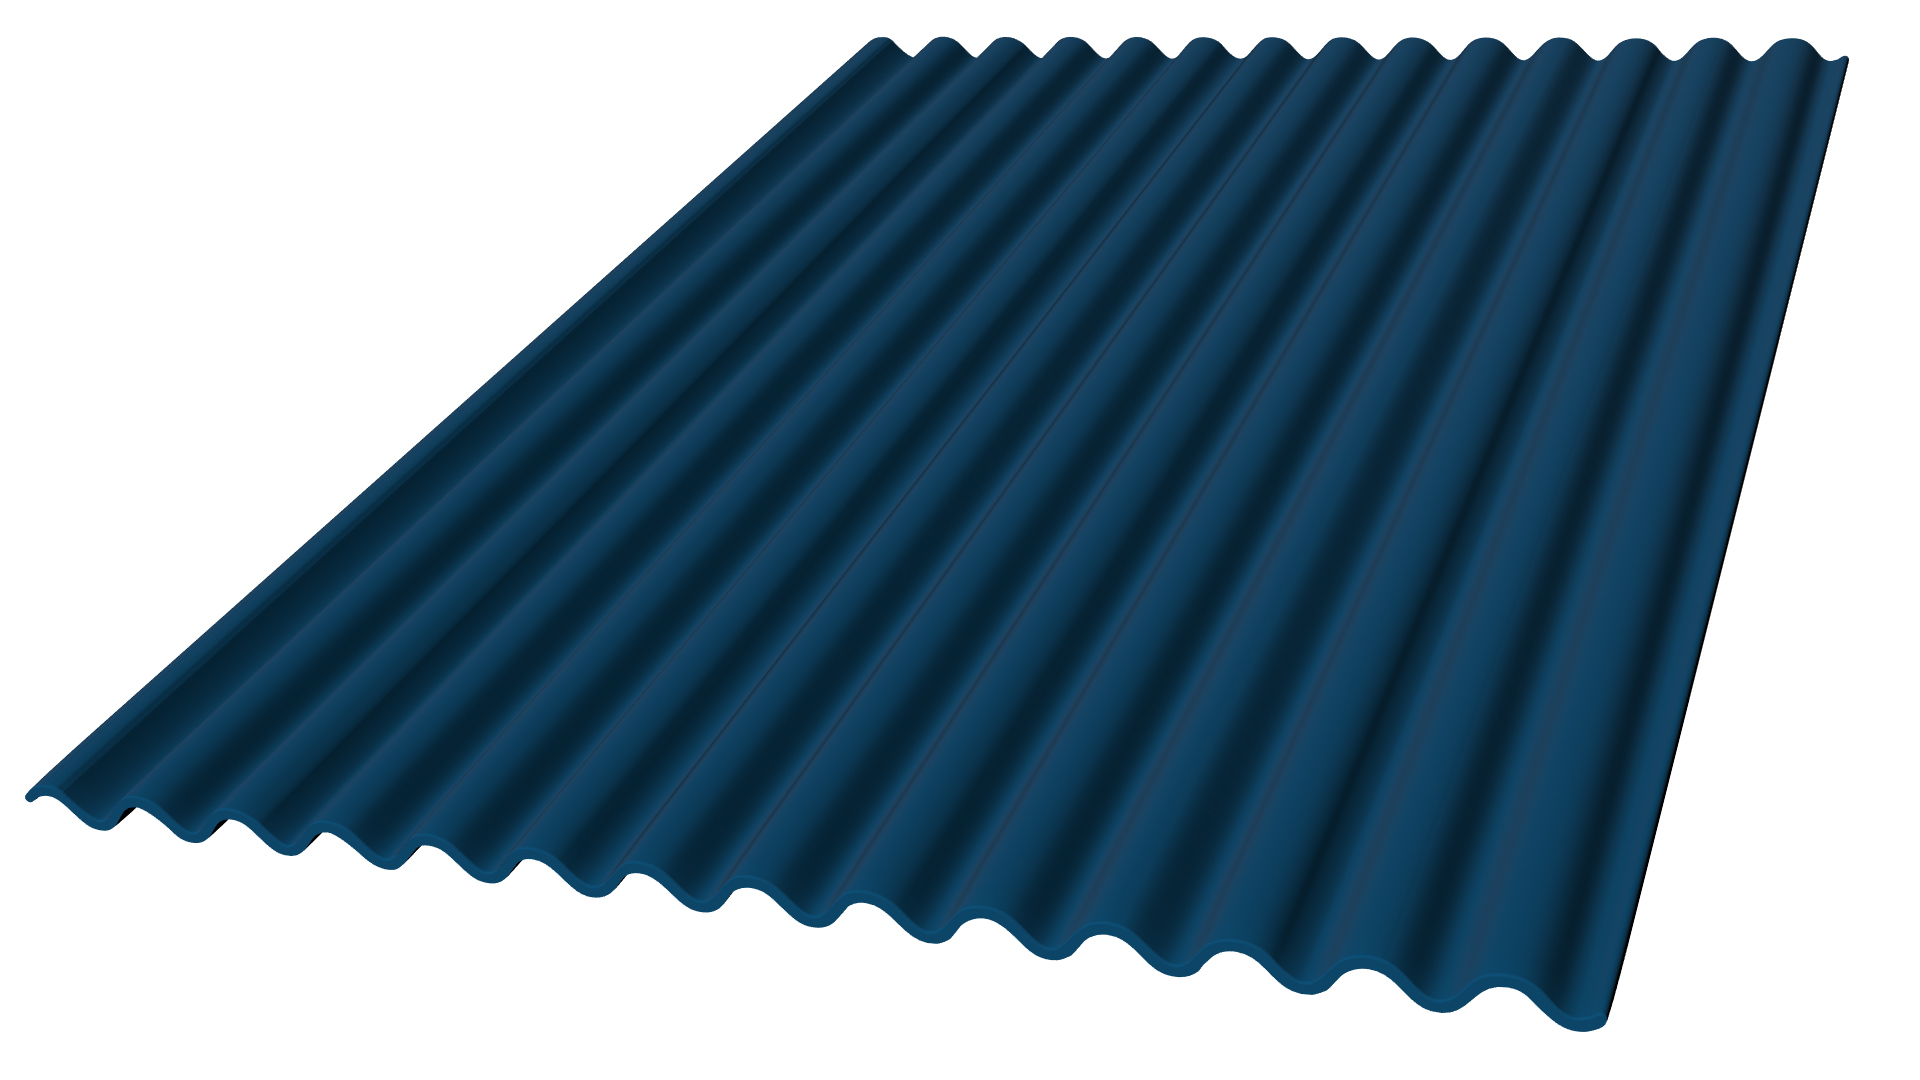 https://f.hubspotusercontent30.net/hubfs/6069238/images/galleries/regal-blue/corrugated-regal-blue-3d.jpg